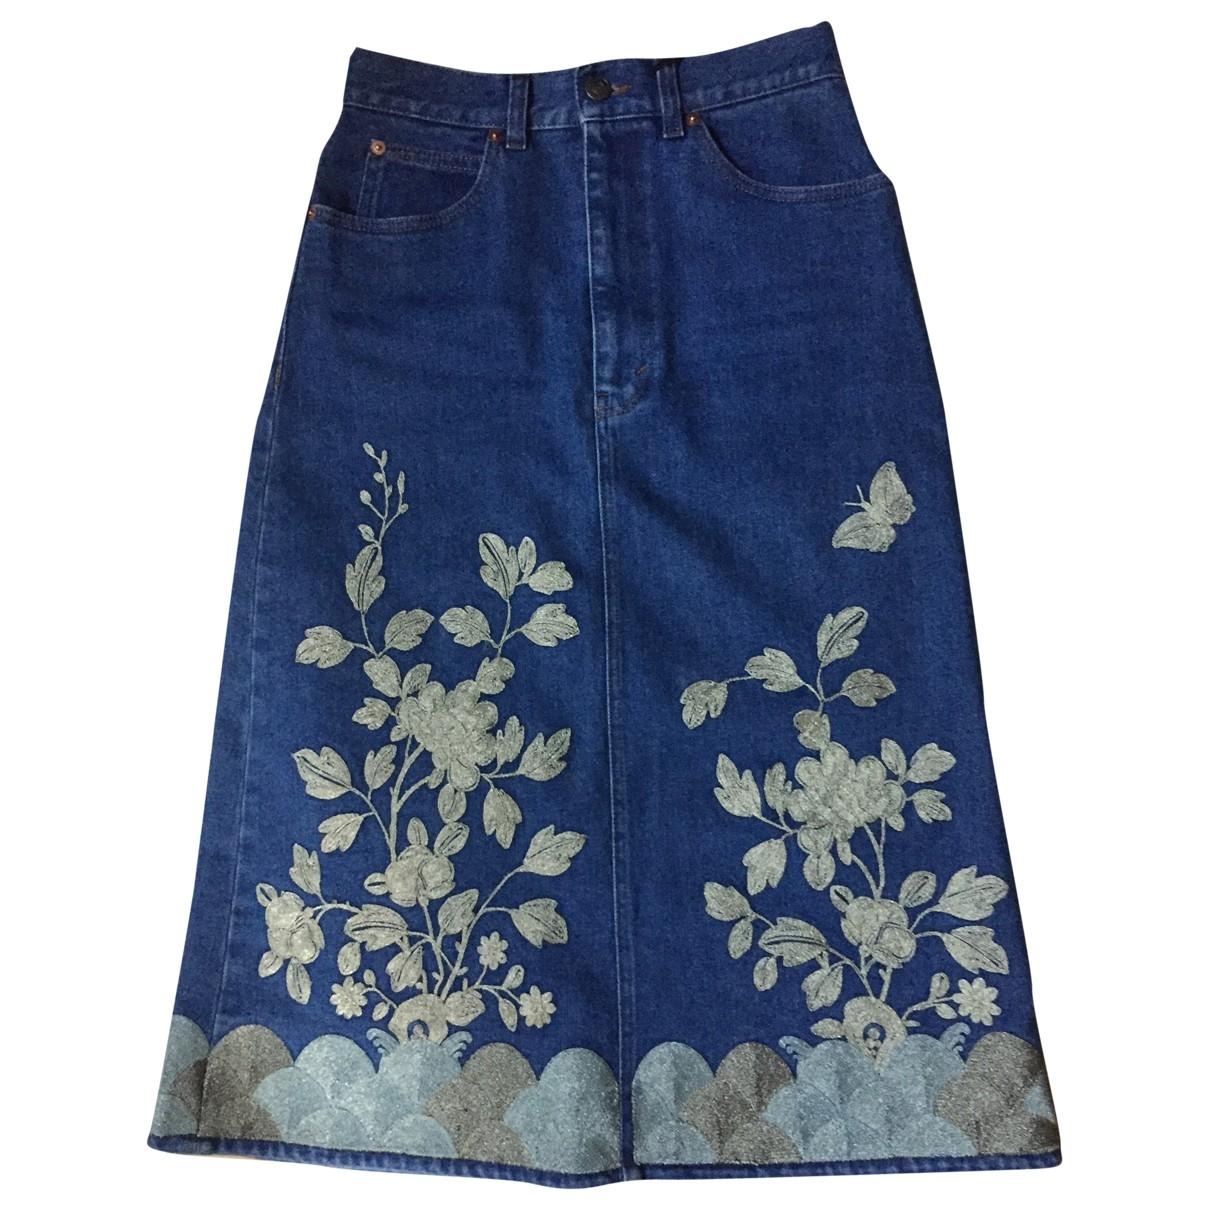 Gucci \N Blue Denim - Jeans skirt for Women 40 IT